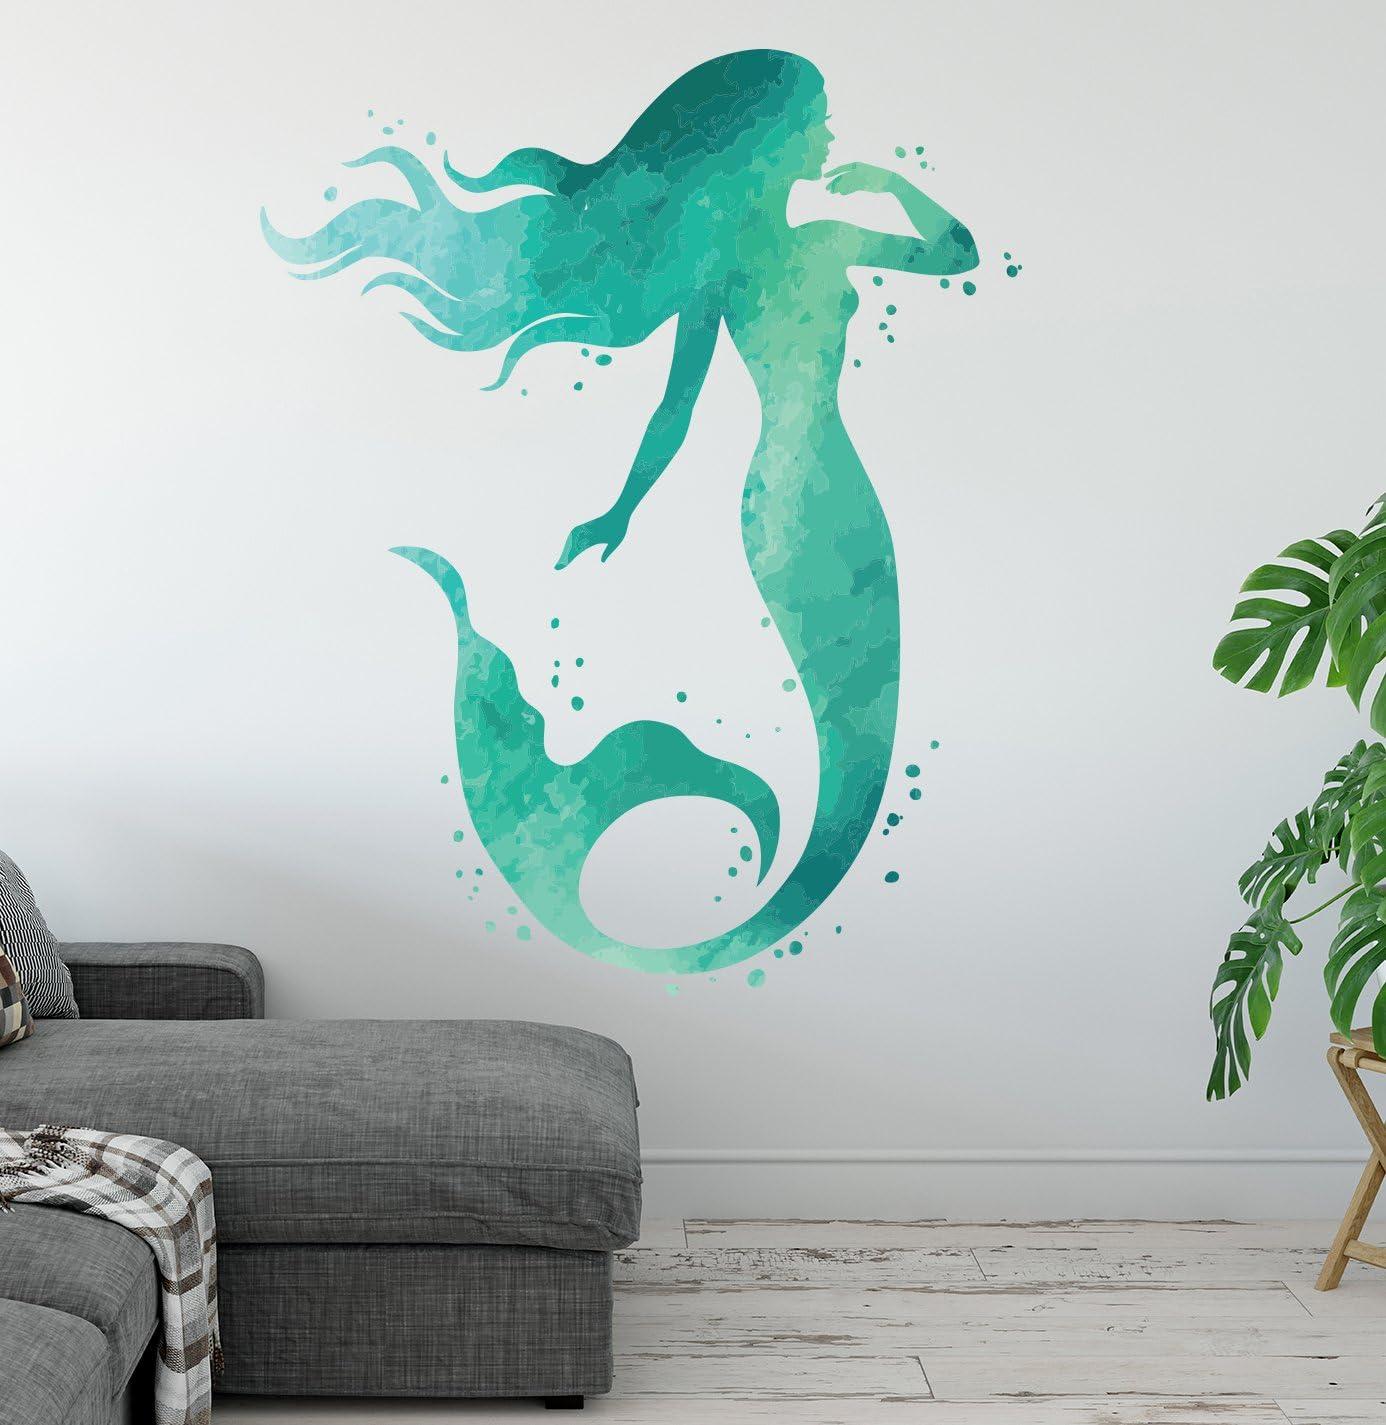 Mermaid Wall Decal Water Nymph Sticker Animal Wall Decals Vinyl Sticker Bathroom Wall Art Bedroom Decor Waterproof Decal 5elksq